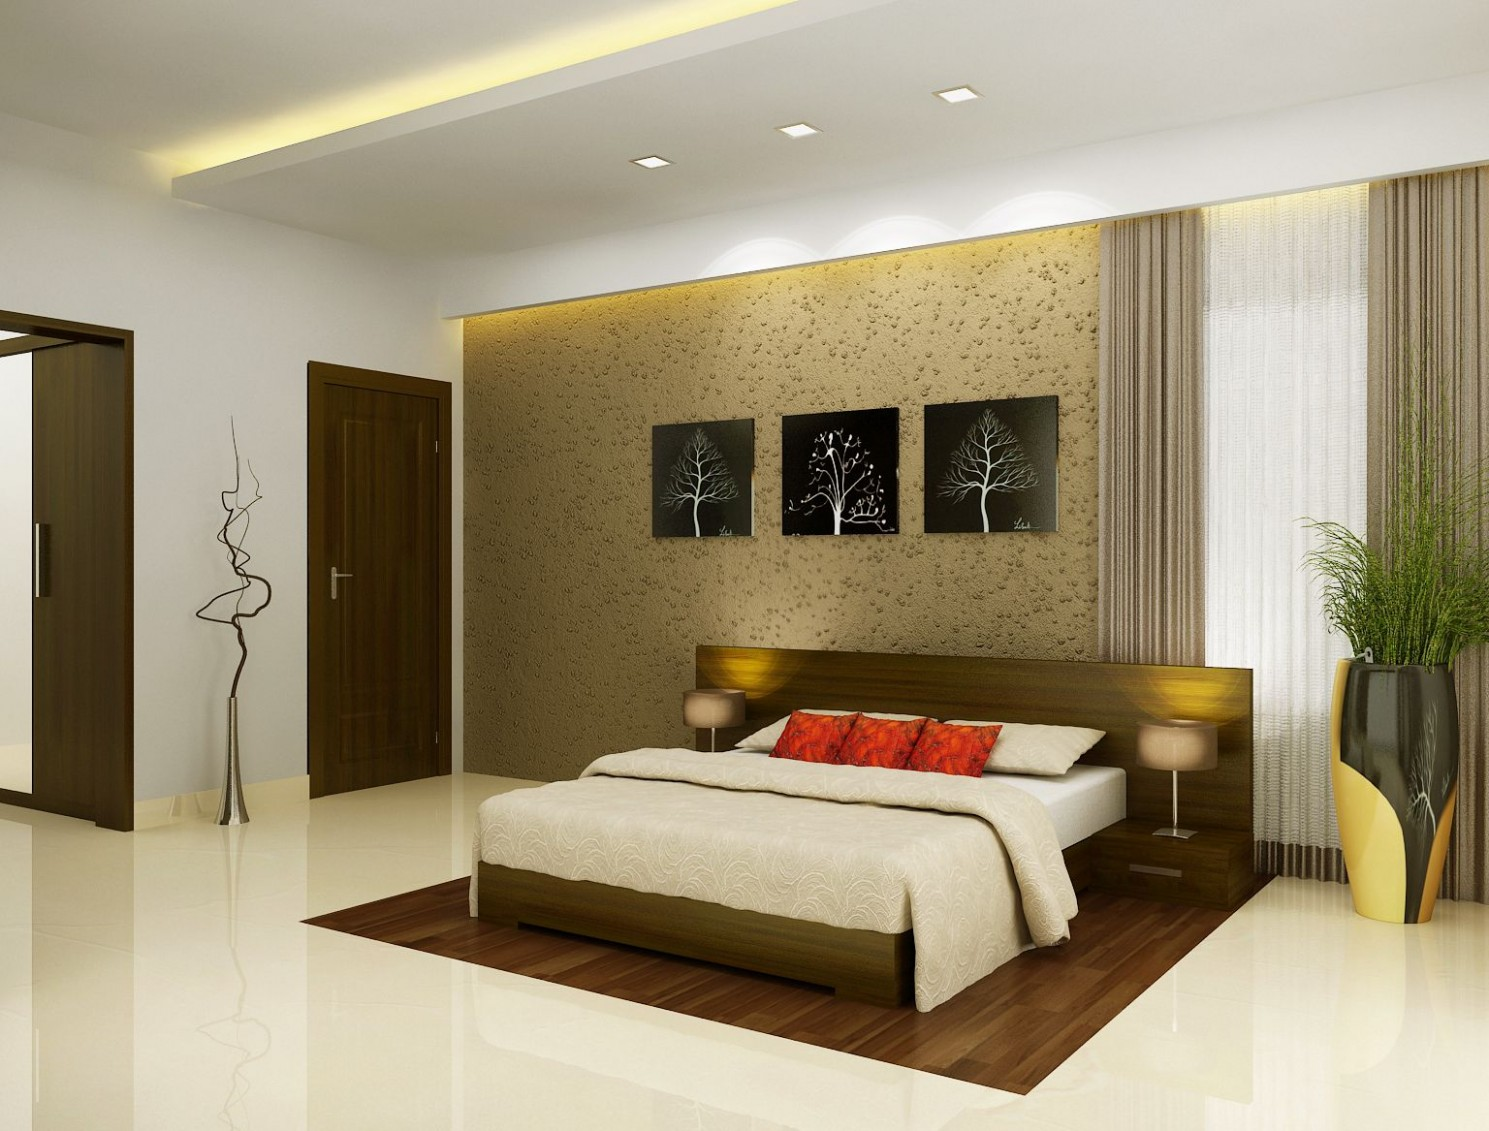 Bedroom Design Ideas Kerala Style  Home Decor - Bedroom Ideas Kerala